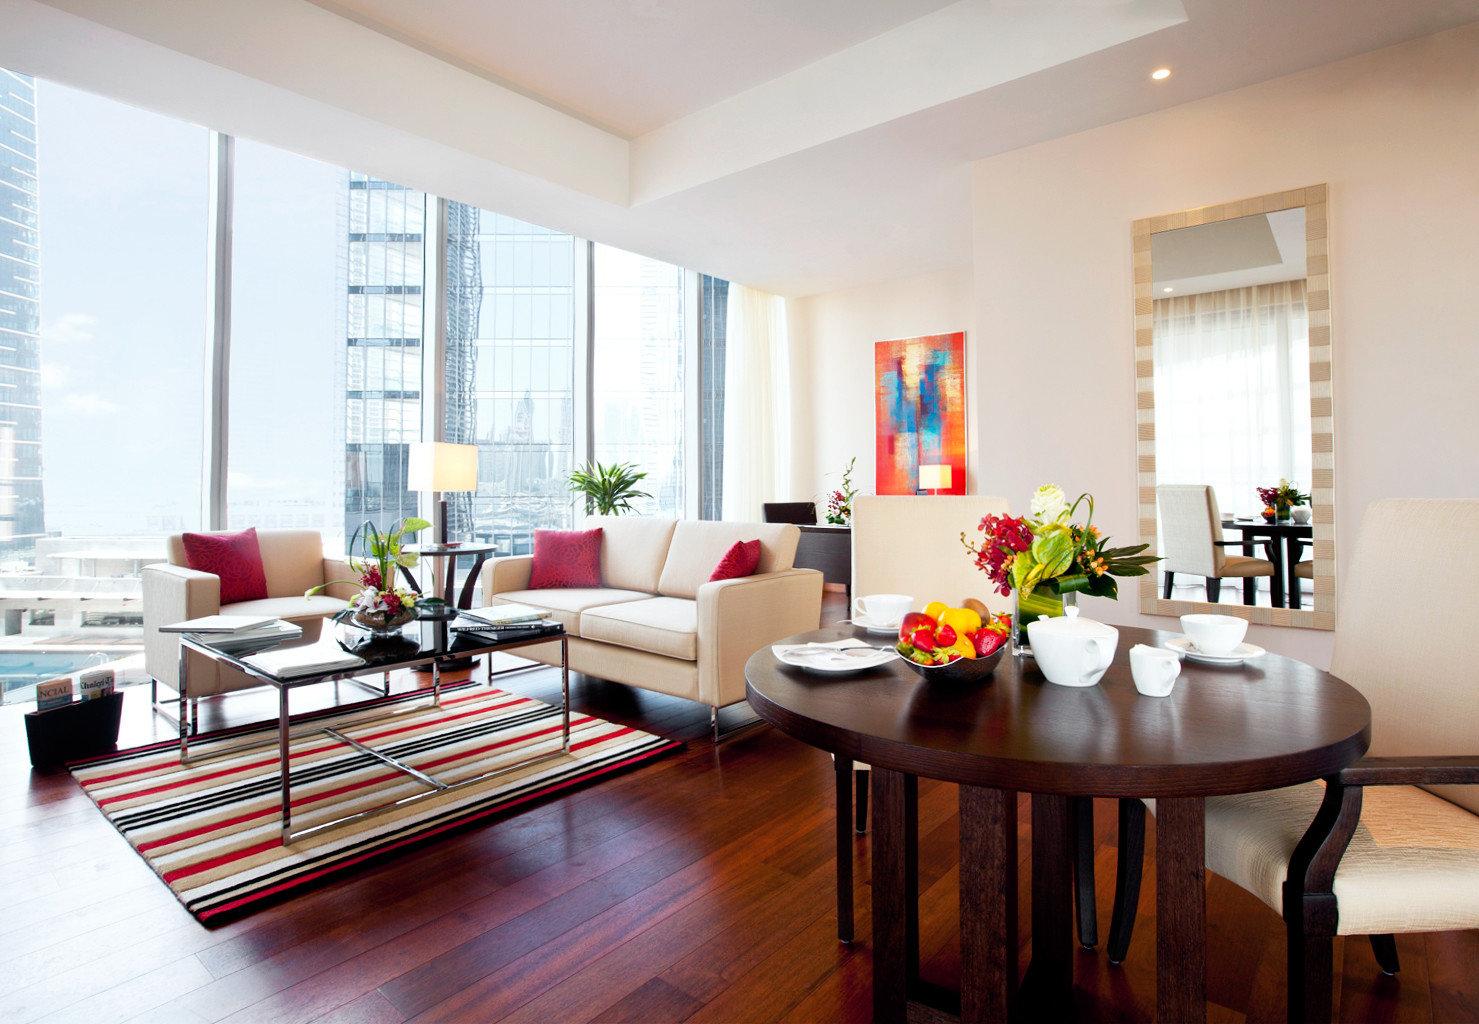 Lounge Luxury Modern Scenic views living room property home hardwood condominium Dining wood flooring loft flat hard